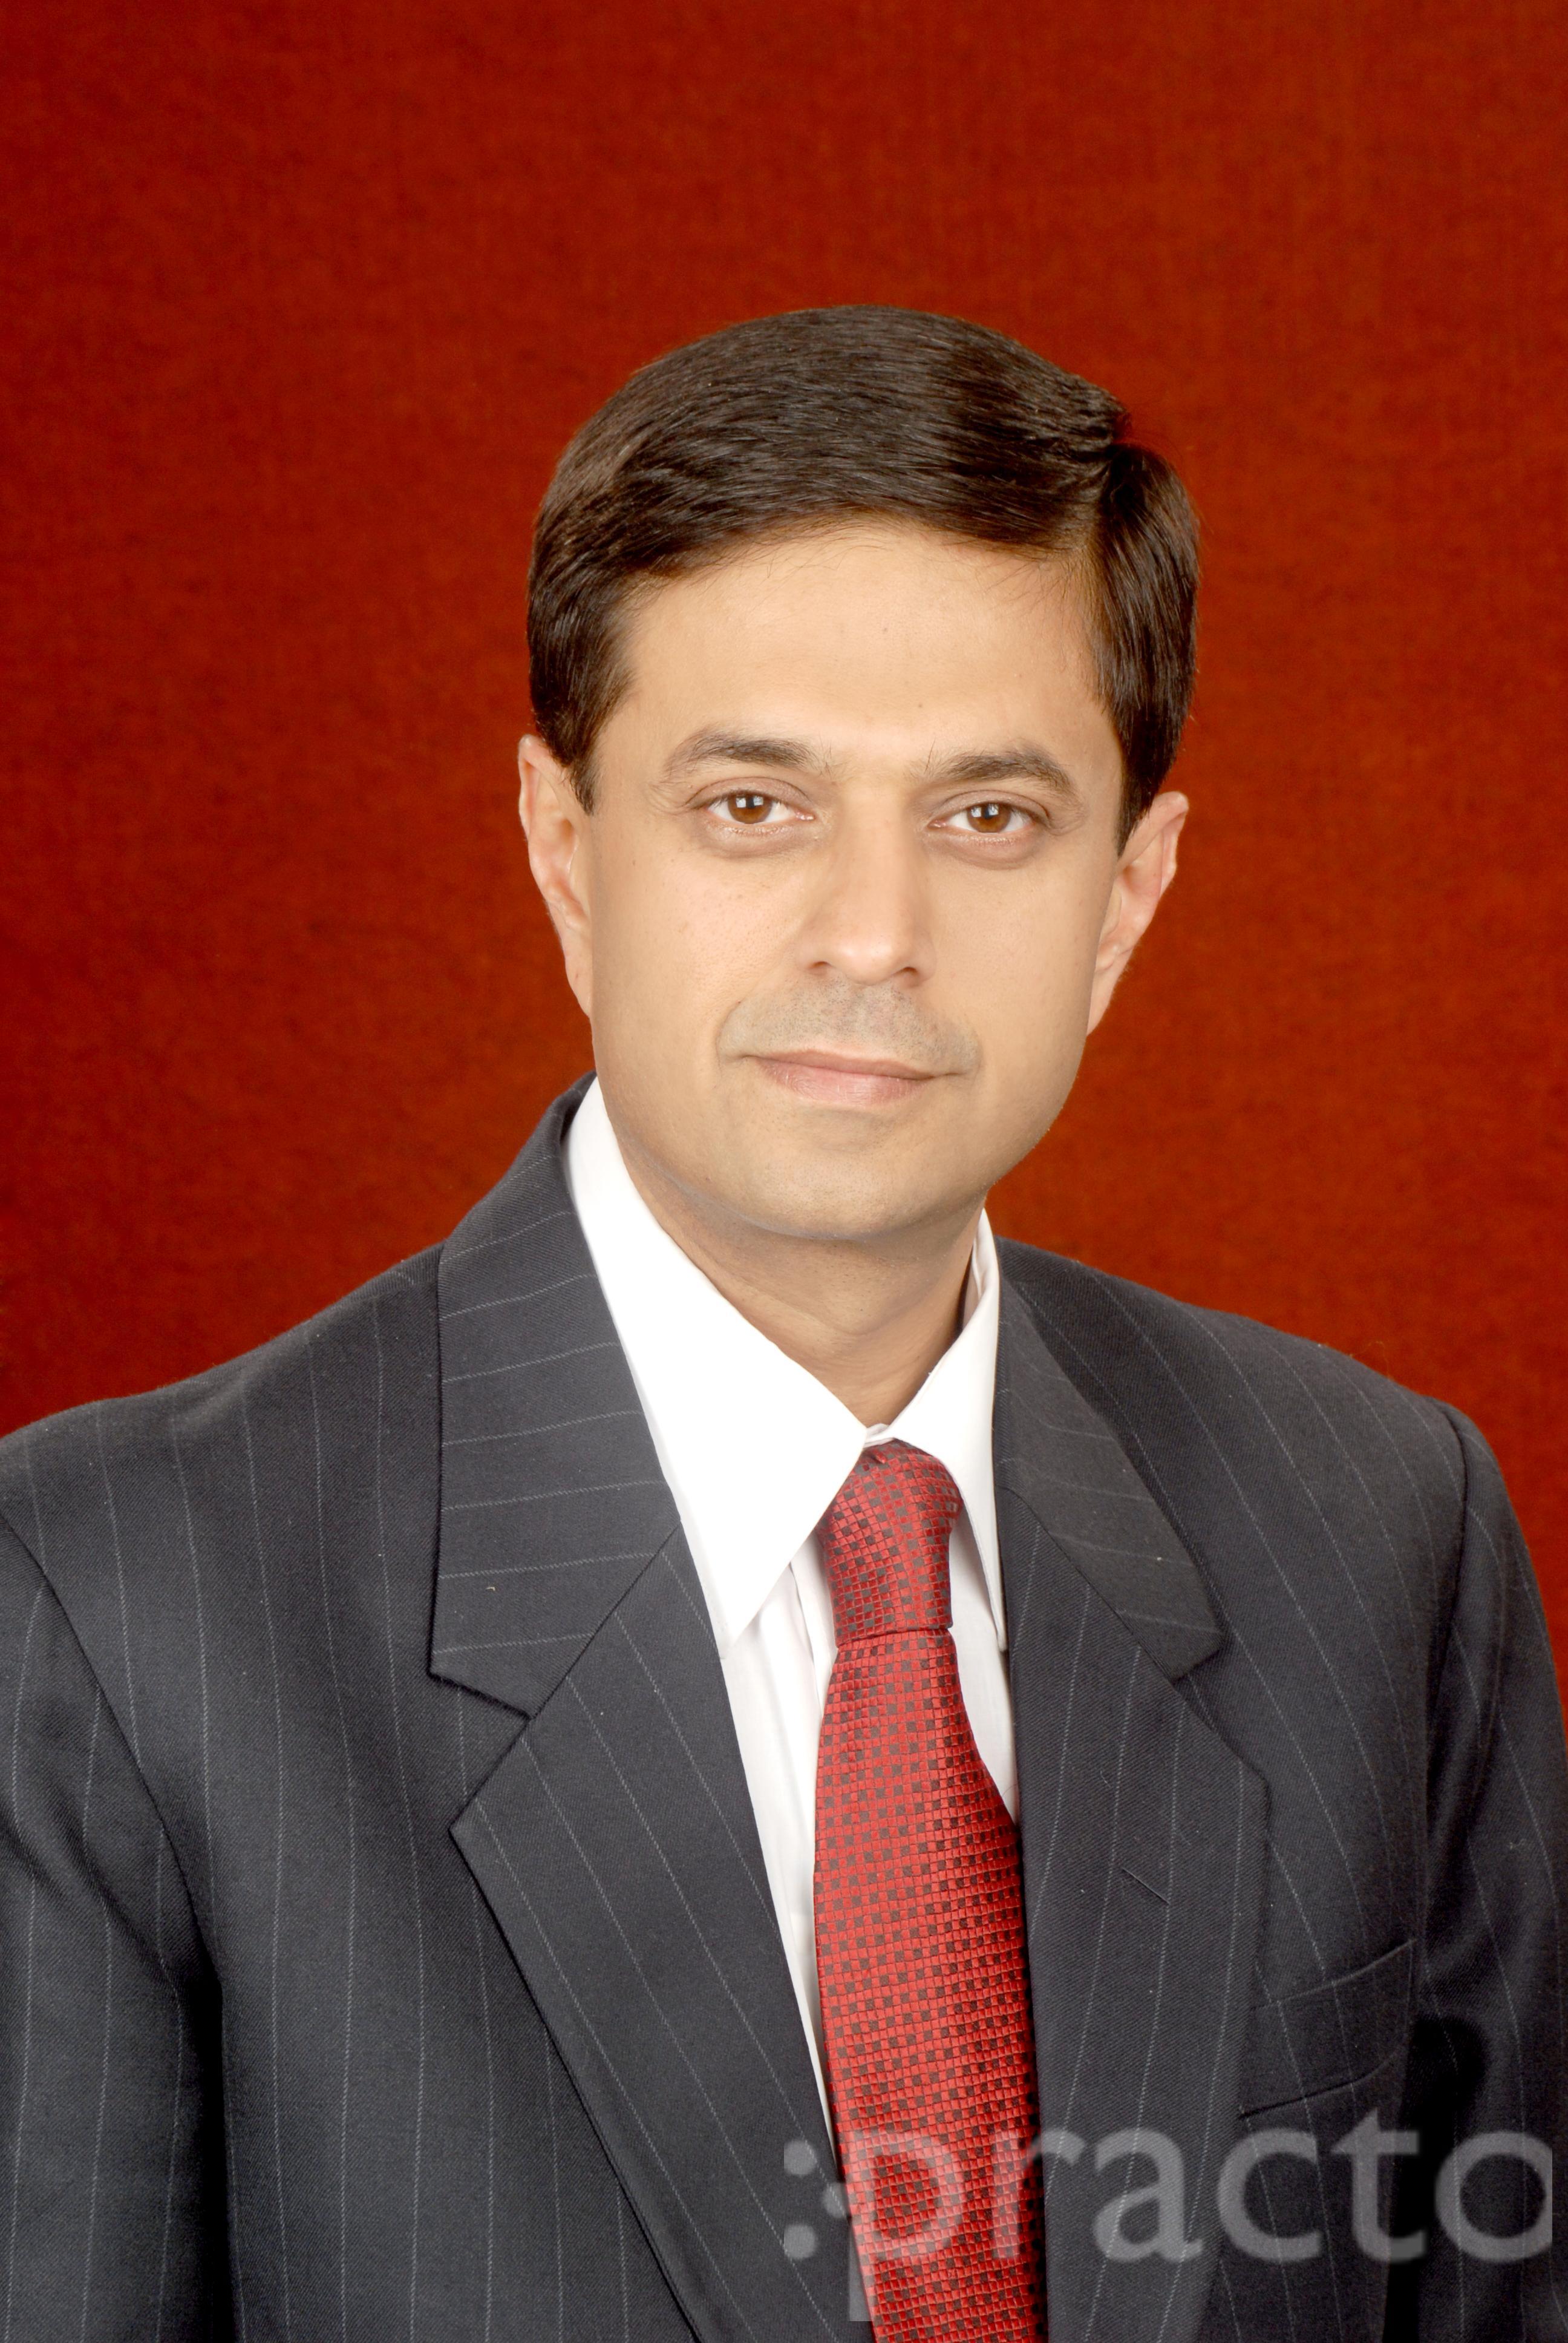 Dr. Rajeev Thaper - Dentist